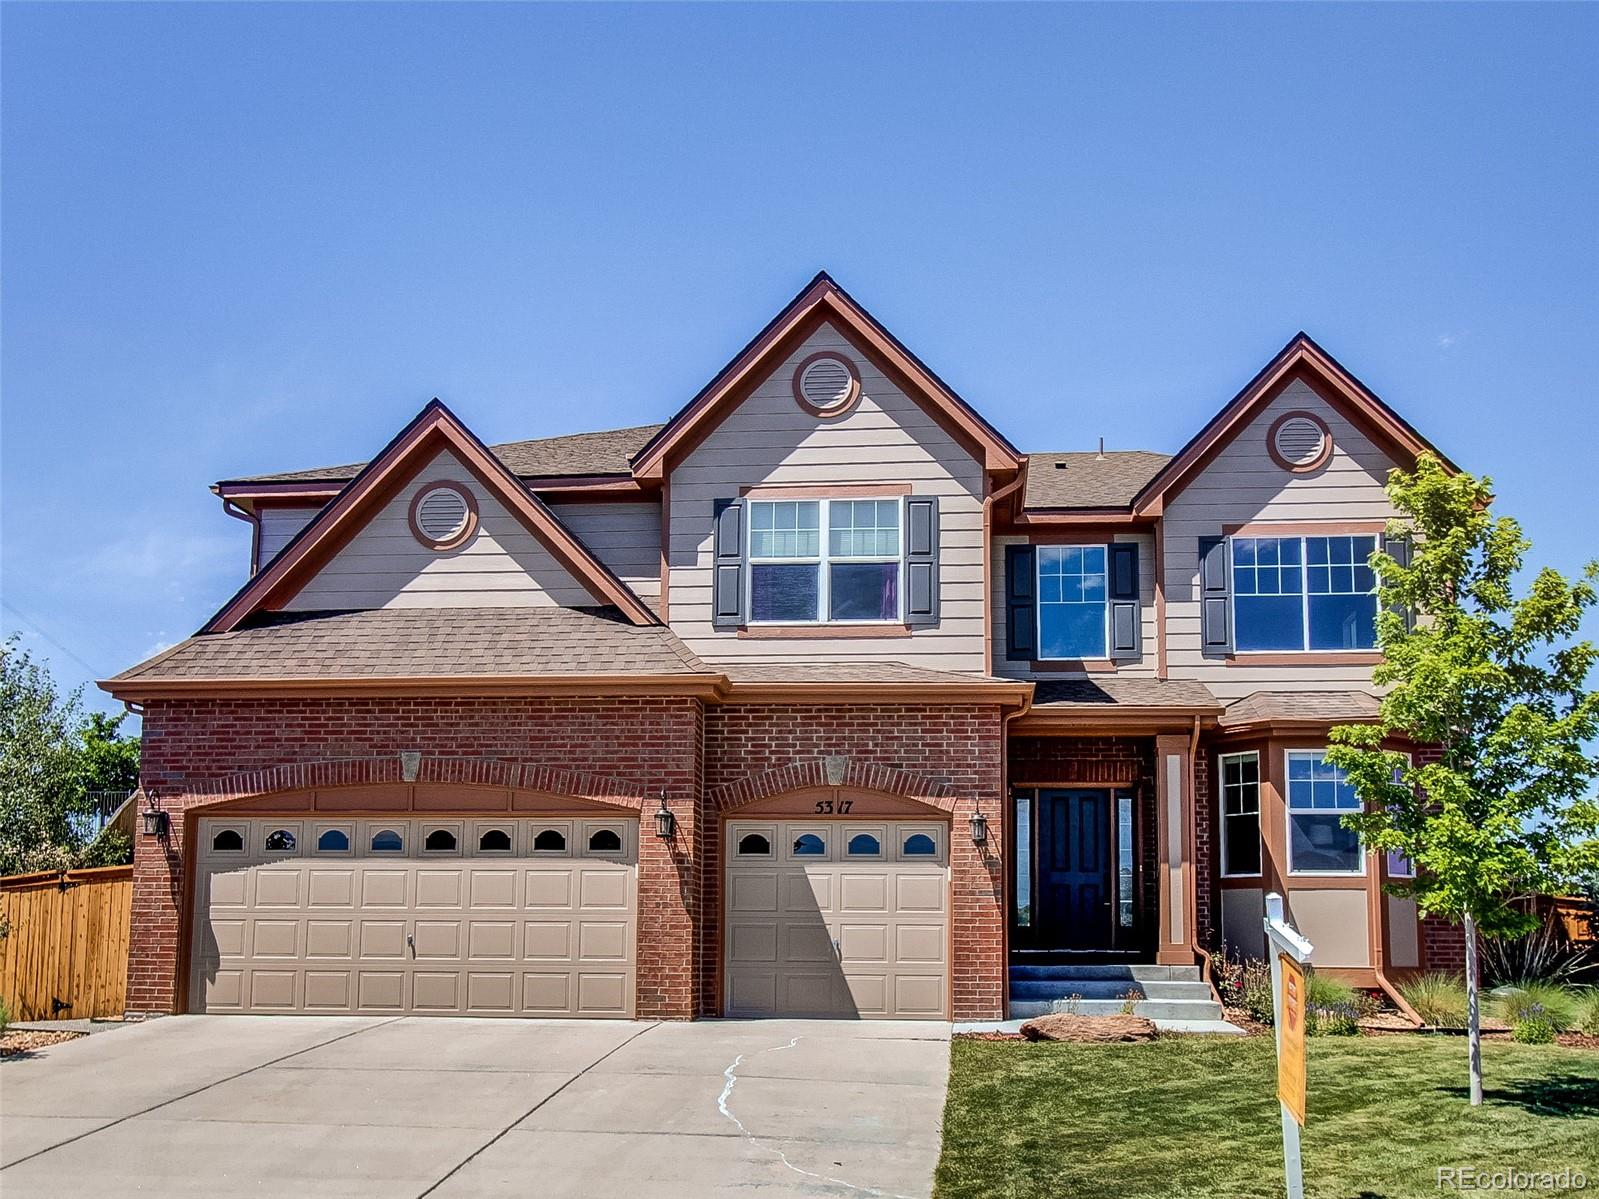 5317 S Elk Way Property Photo - Aurora, CO real estate listing